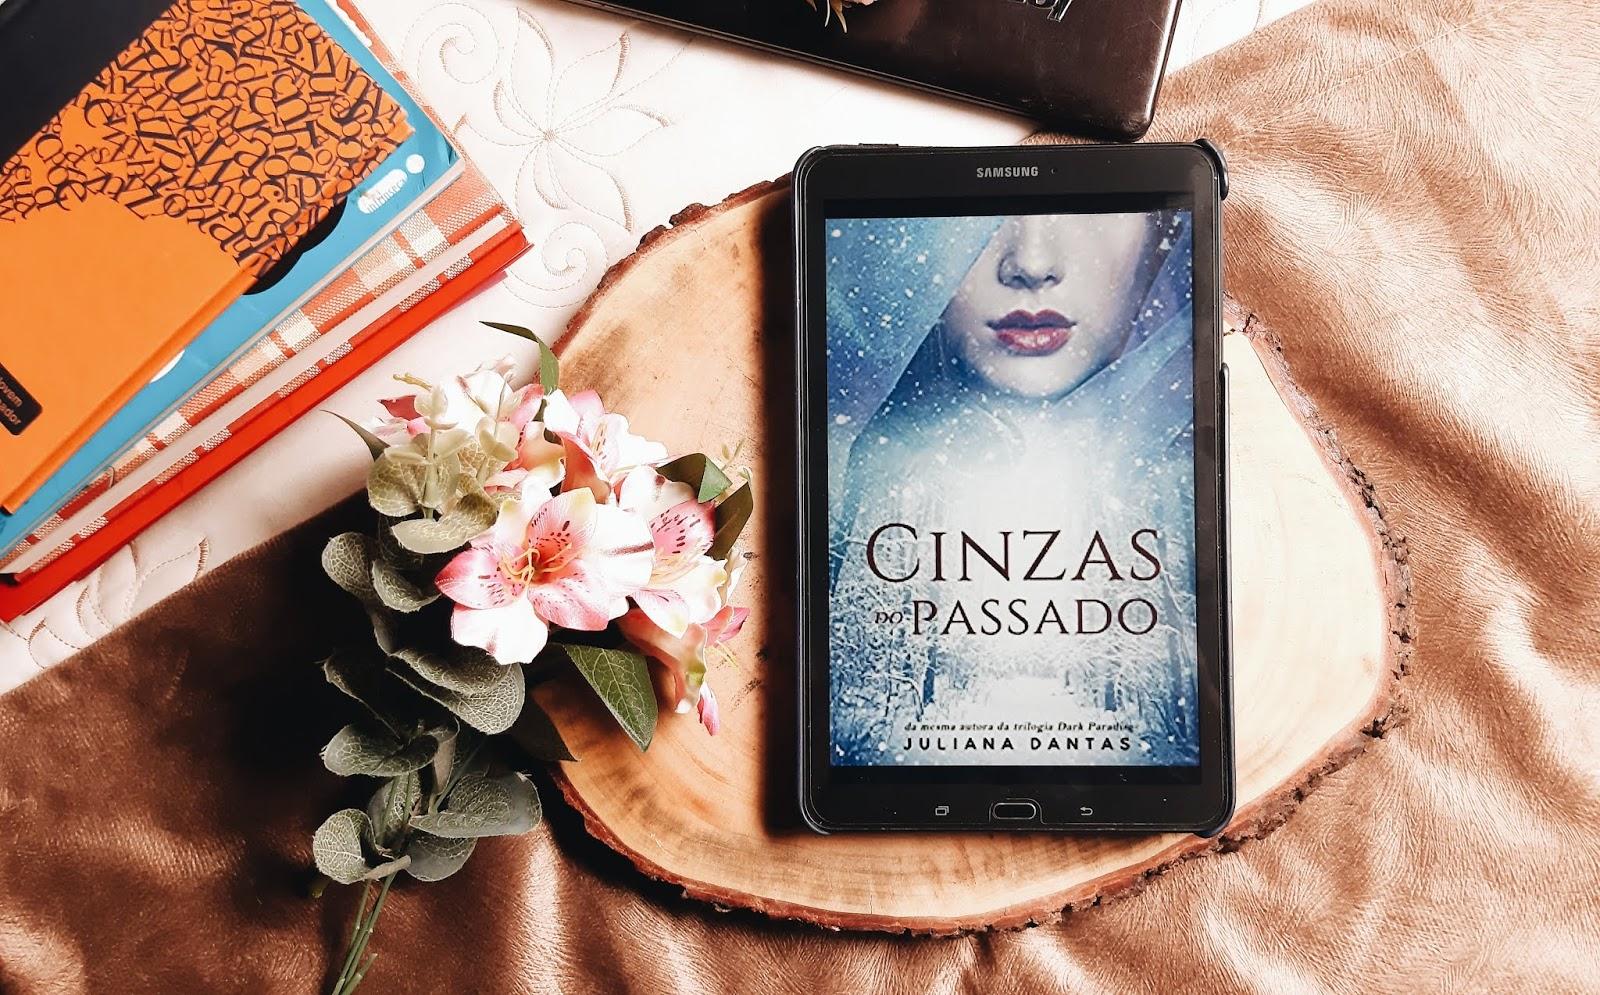 Cinzas do passado - Juliana Dantas | Resenha